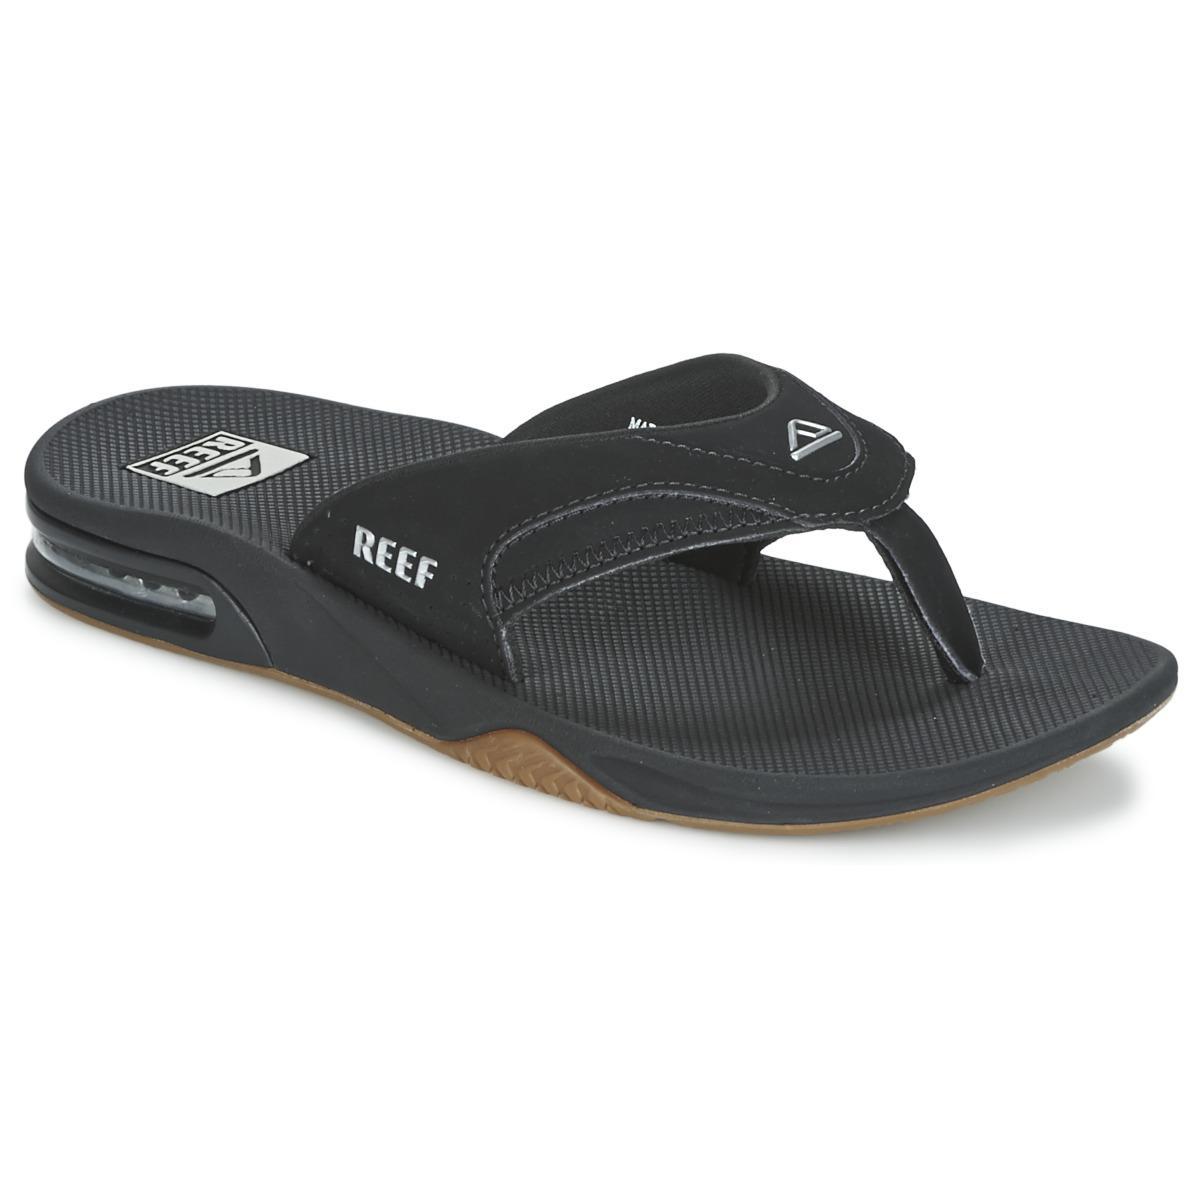 3d7362b42fcc3 Reef - Fanning Men s Flip Flops   Sandals (shoes) In Black for Men -. View  fullscreen